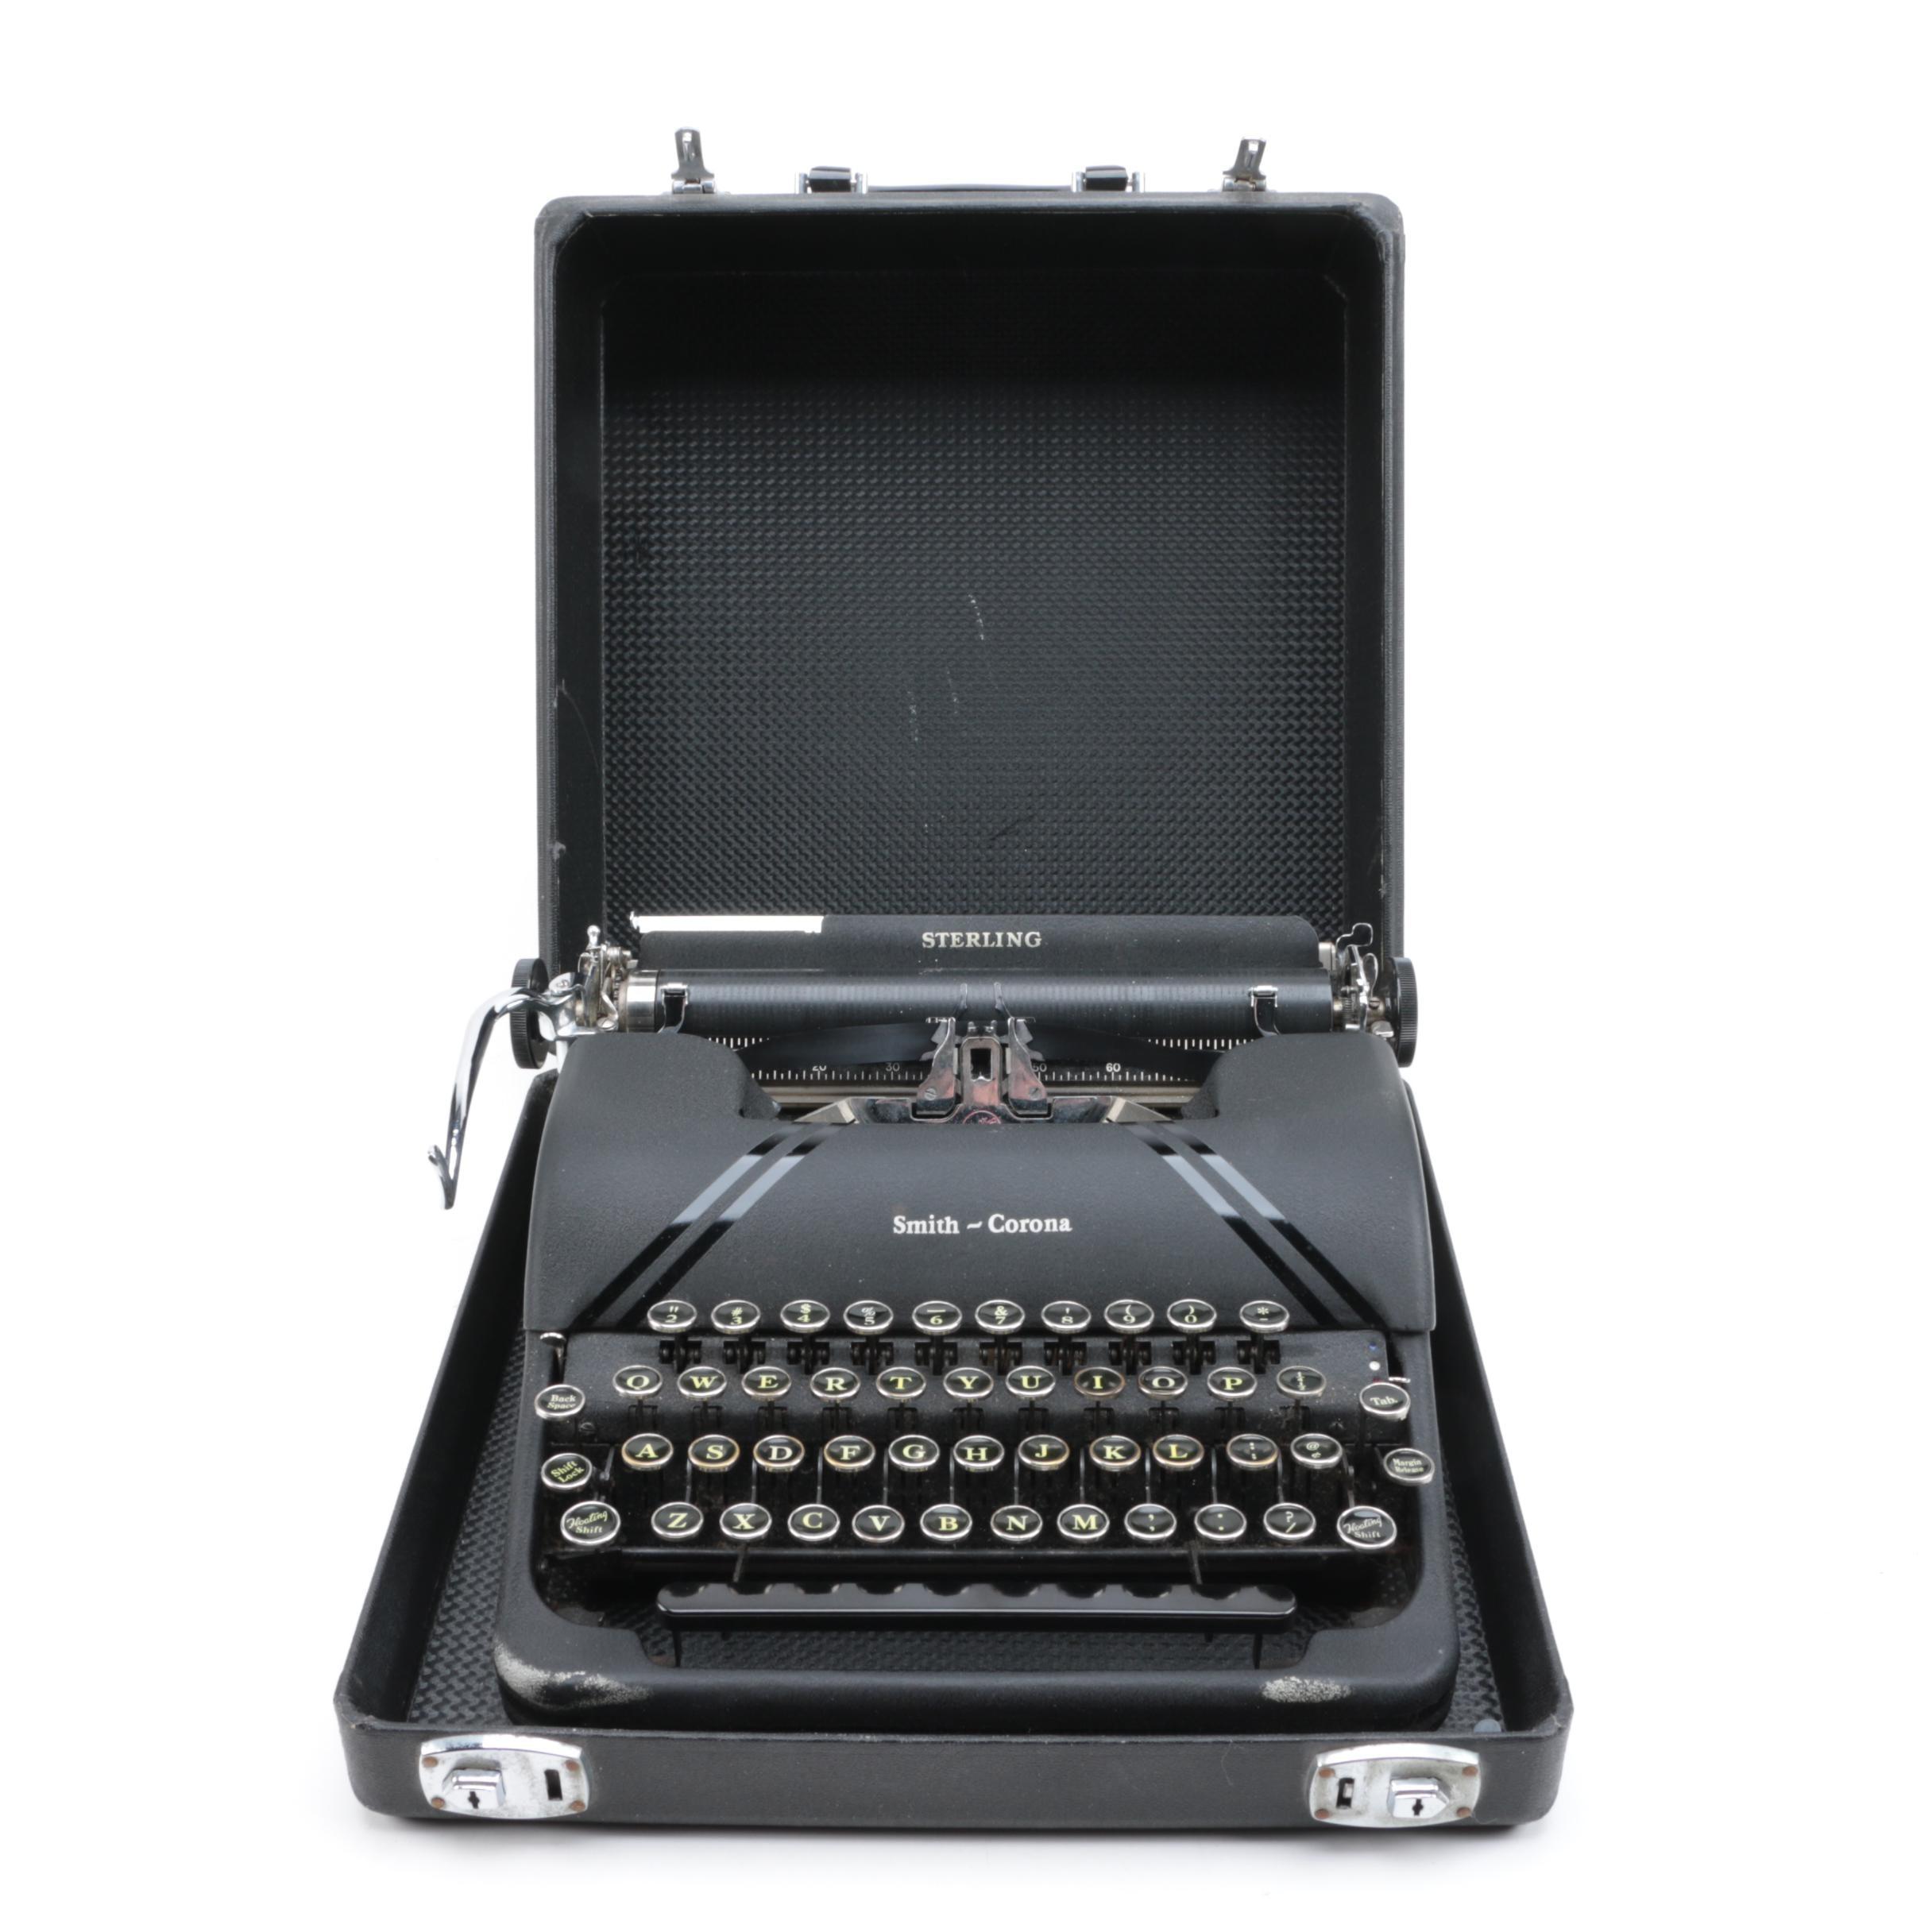 "Smith-Corona ""Sterling"" Typewriter"